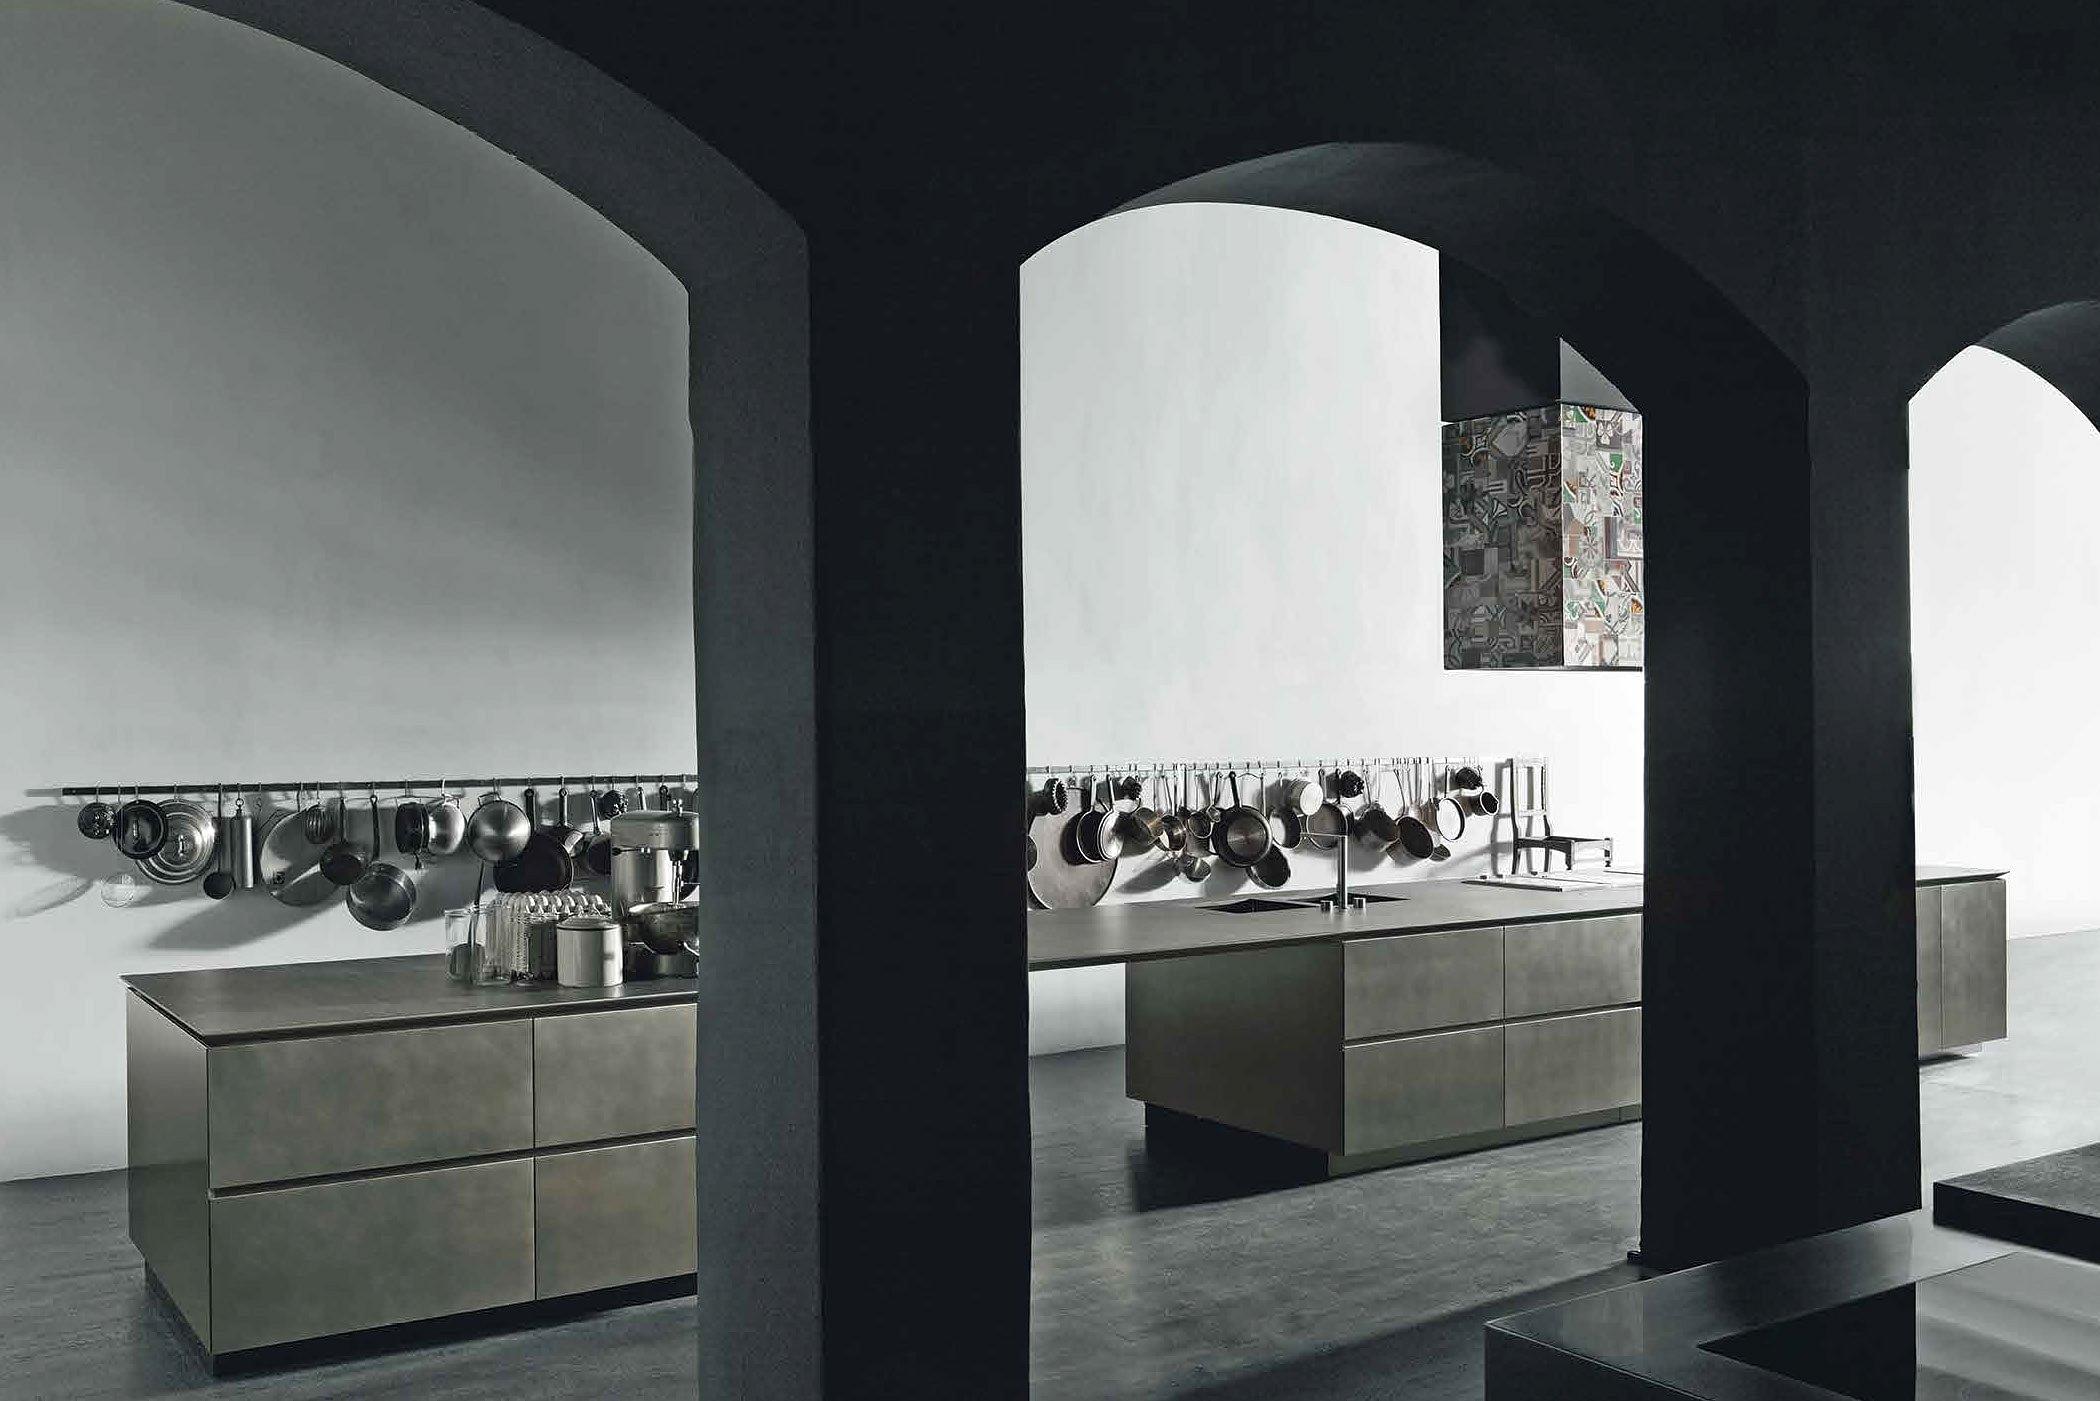 Boffi Studio Aarau in Aarau - View address & opening hours on local.ch